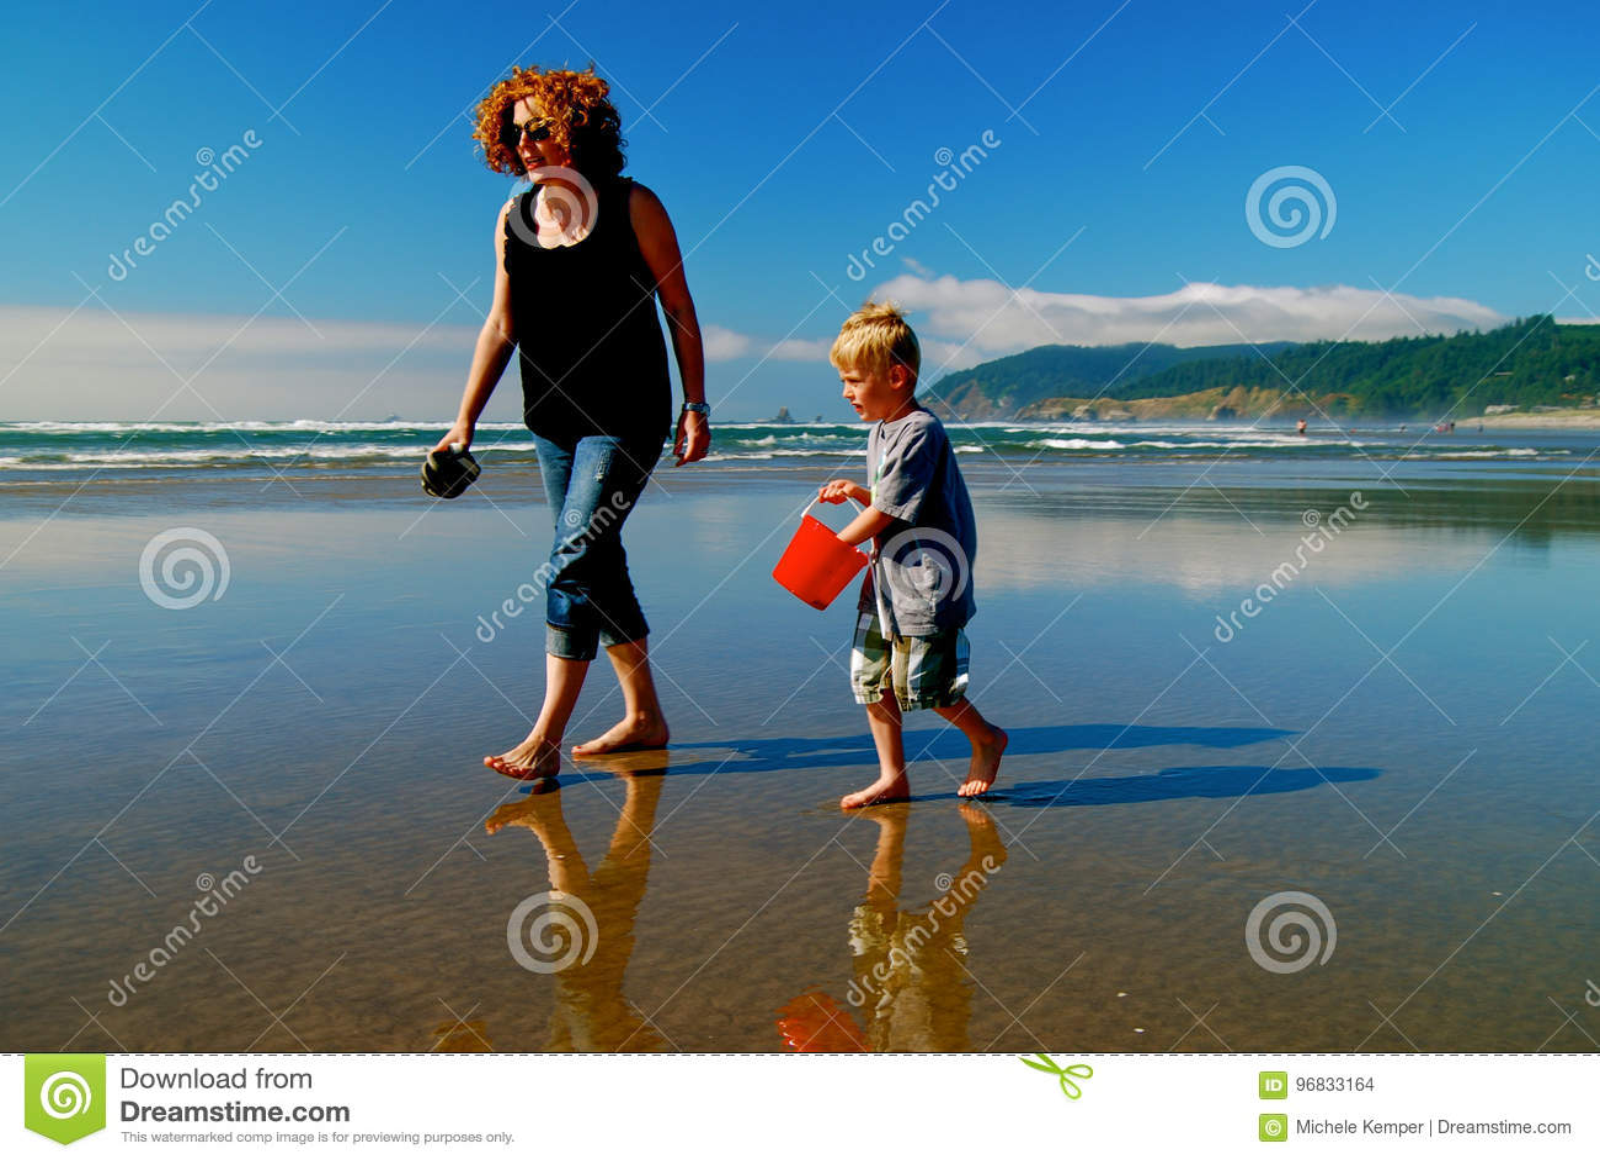 Beachcombers с красным ведром